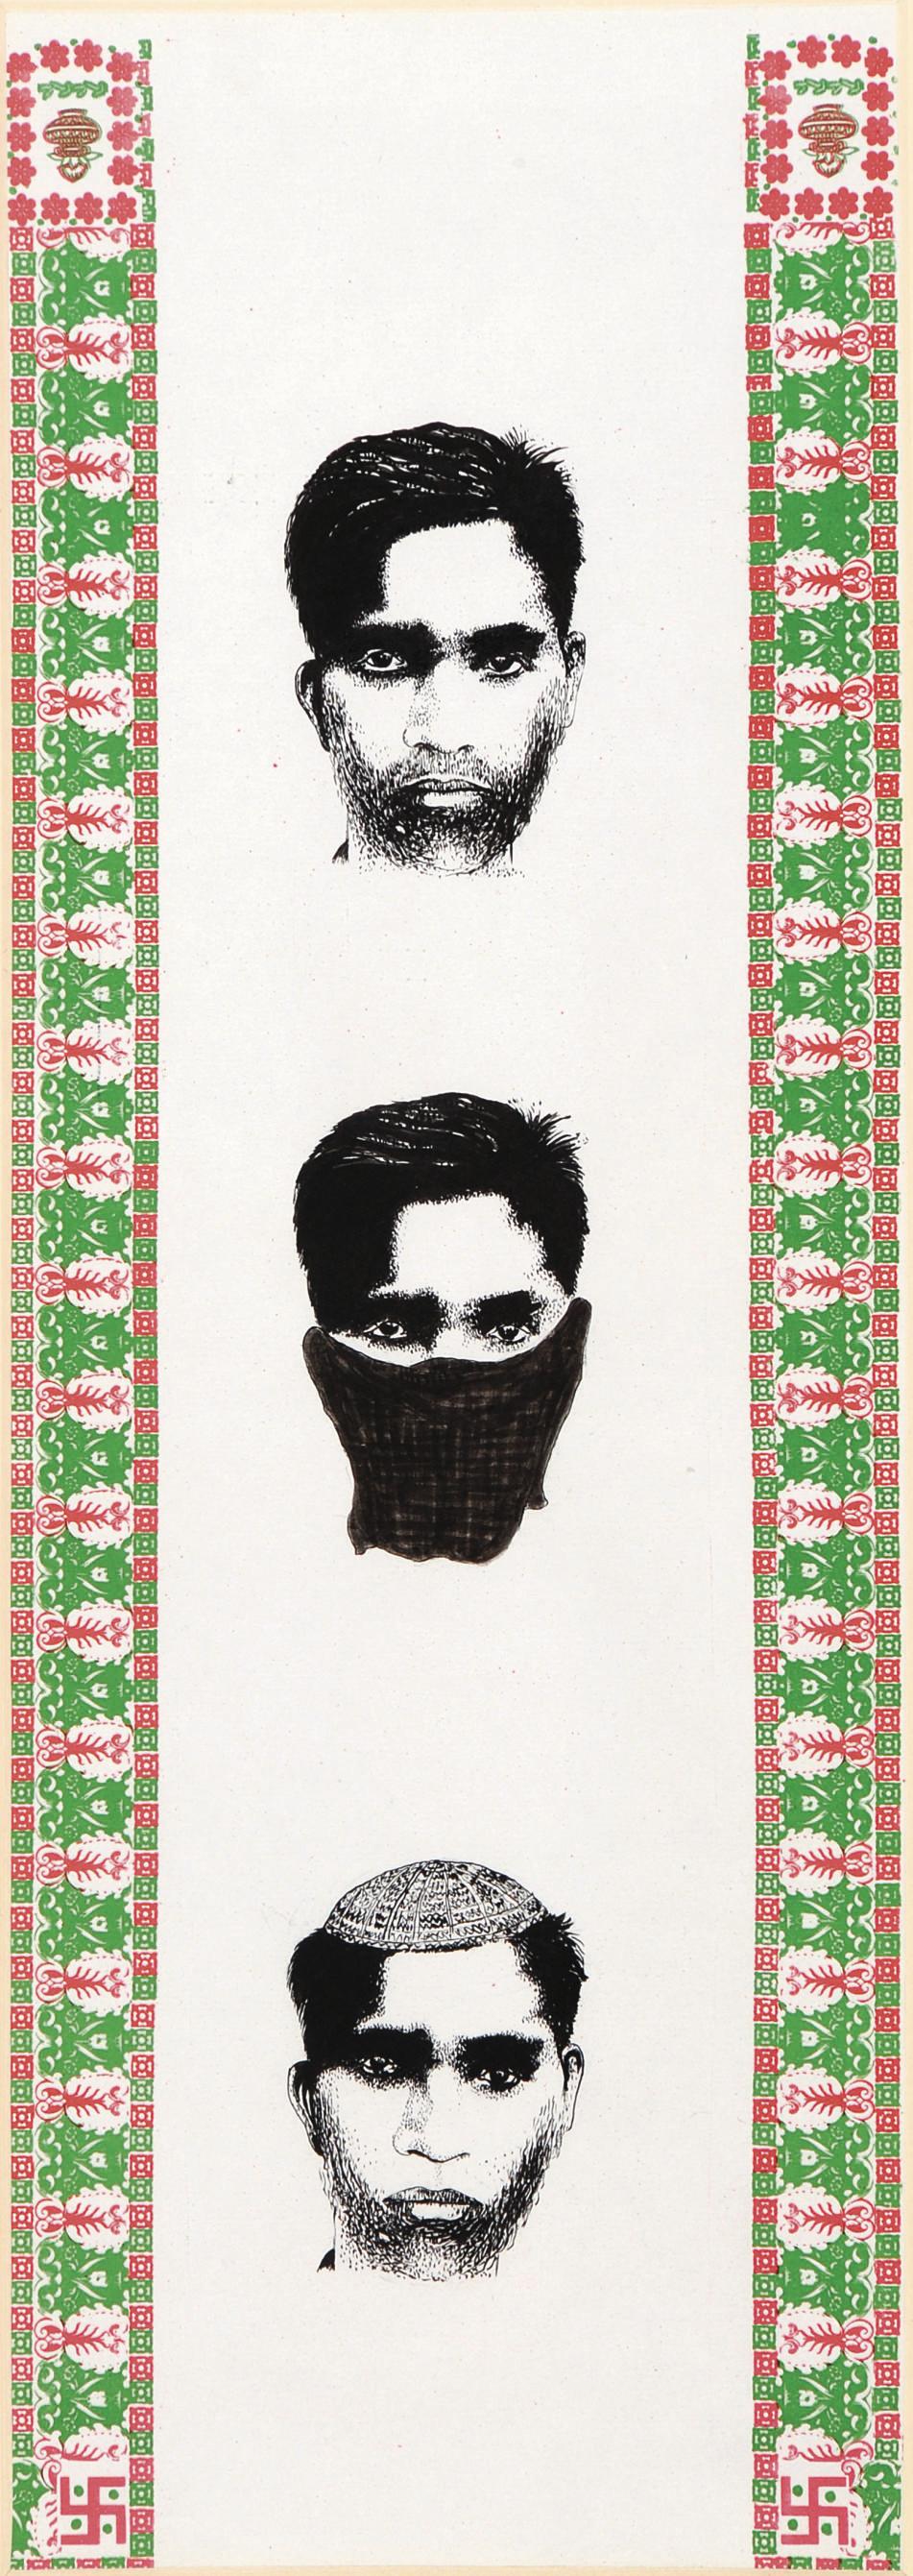 ASHIM PURKAYASTHA (B. 1967)